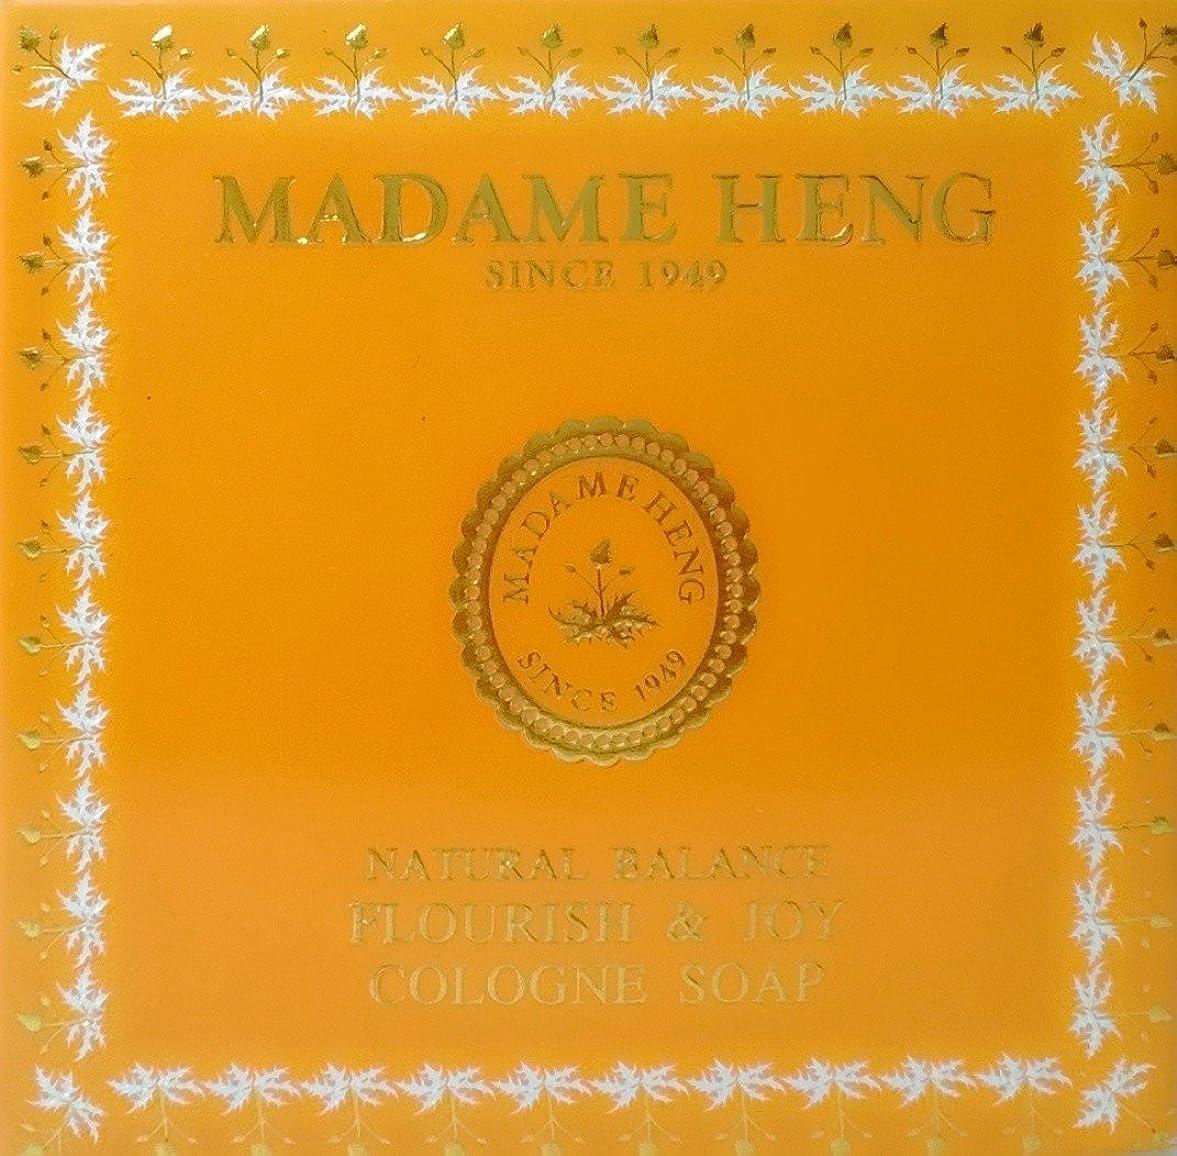 MADAME HENG NATURAL BALANCE FLOURISH & JOY COLOGNE SOAP